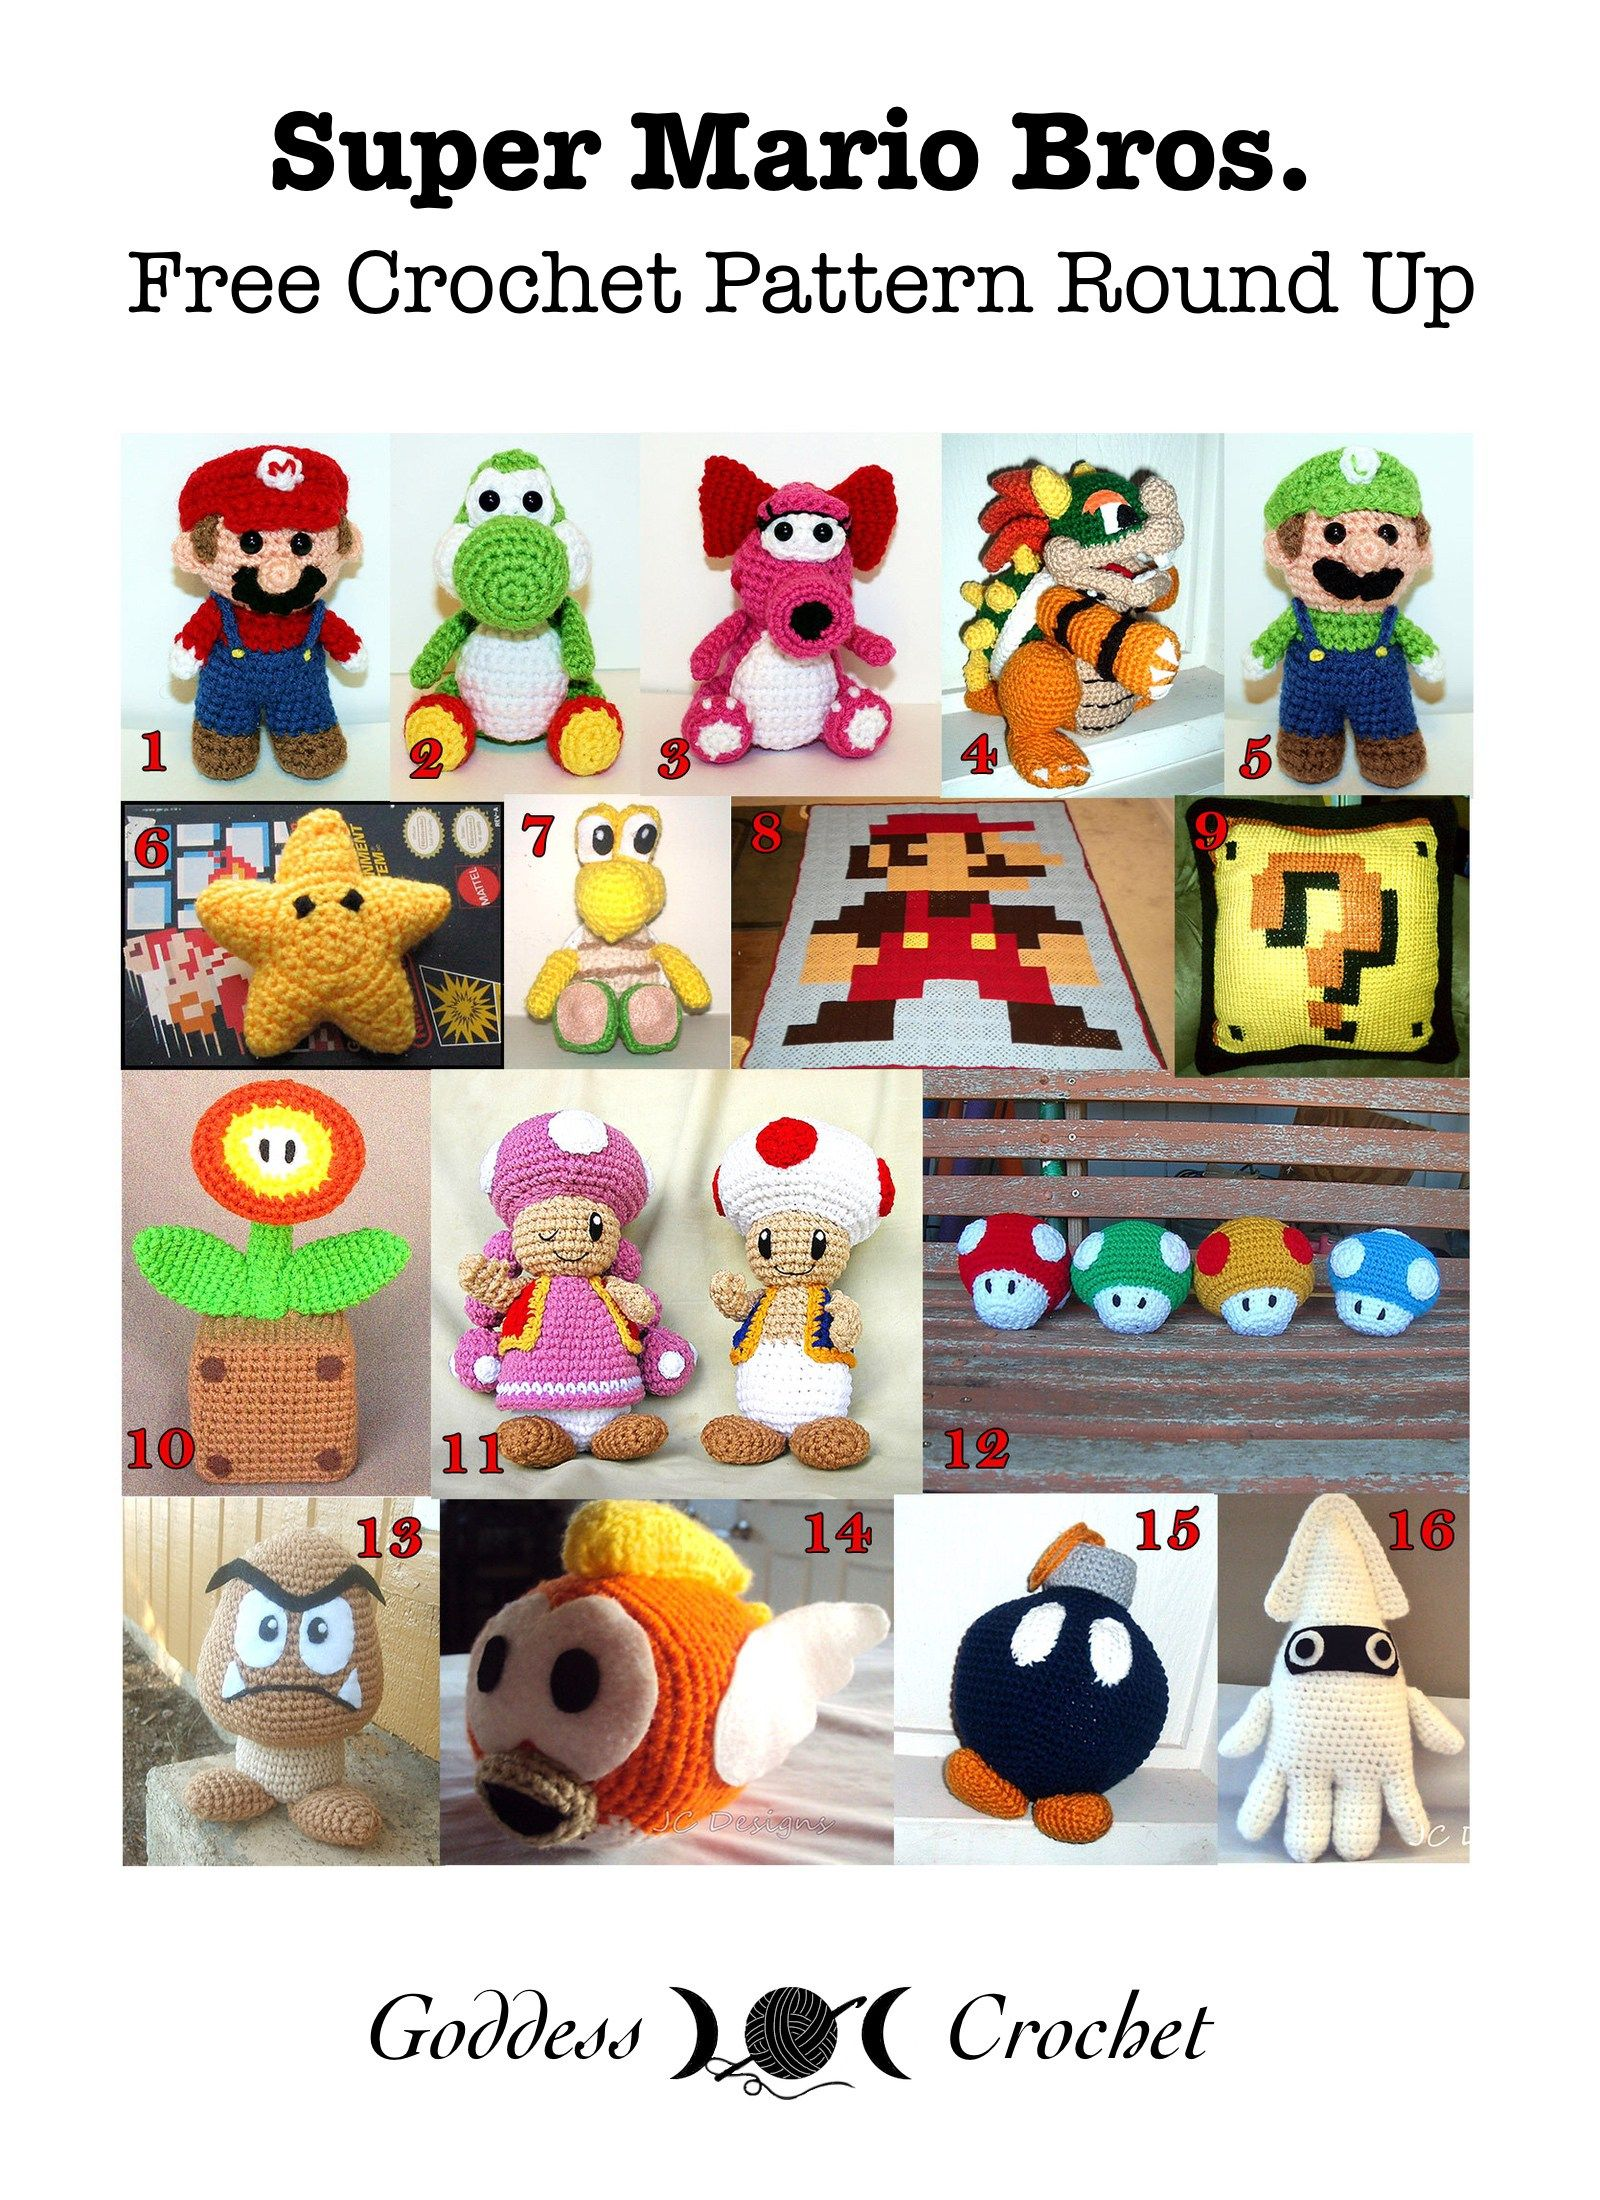 4d5917fd420 Super Mario Bros. - Free Crochet Pattern Round Up